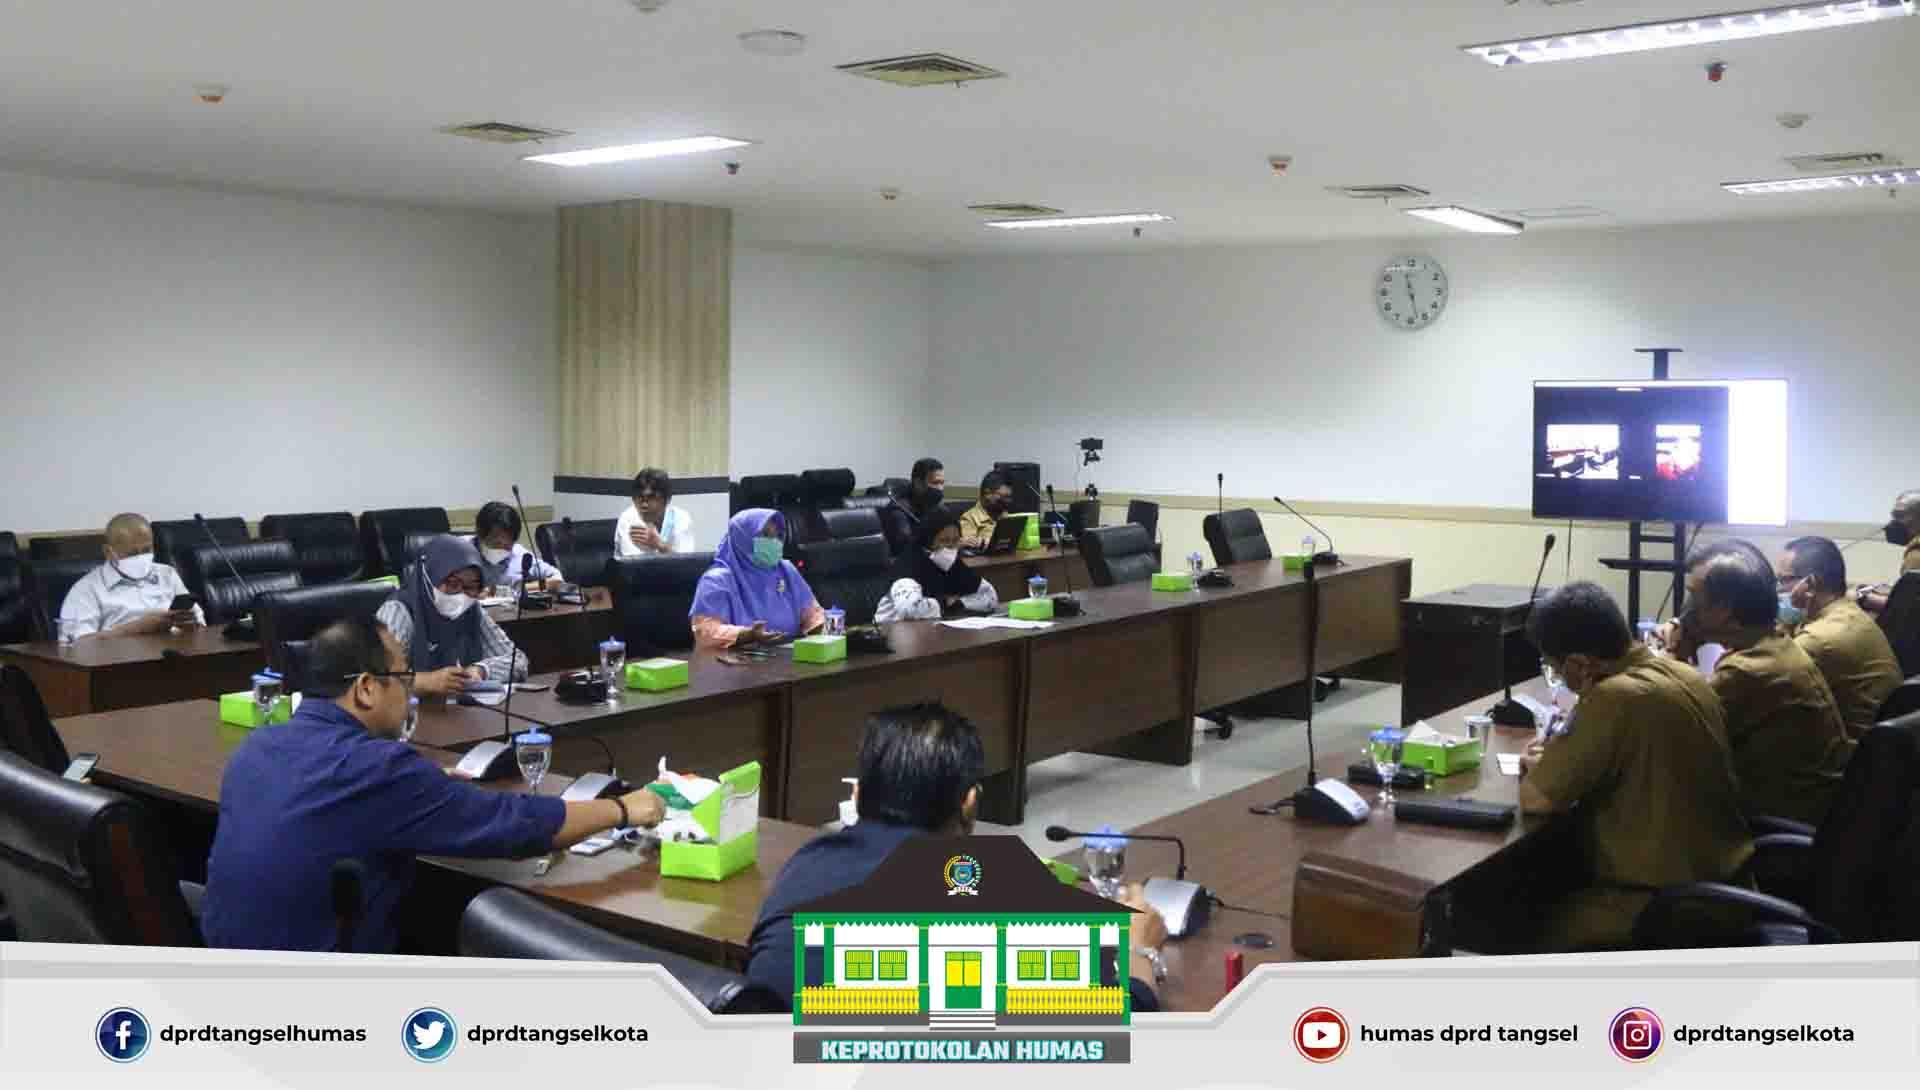 Rapat koordinasi dengan Pimpinan DPRD, Pimpinan Komisi dan Tenaga Ahli